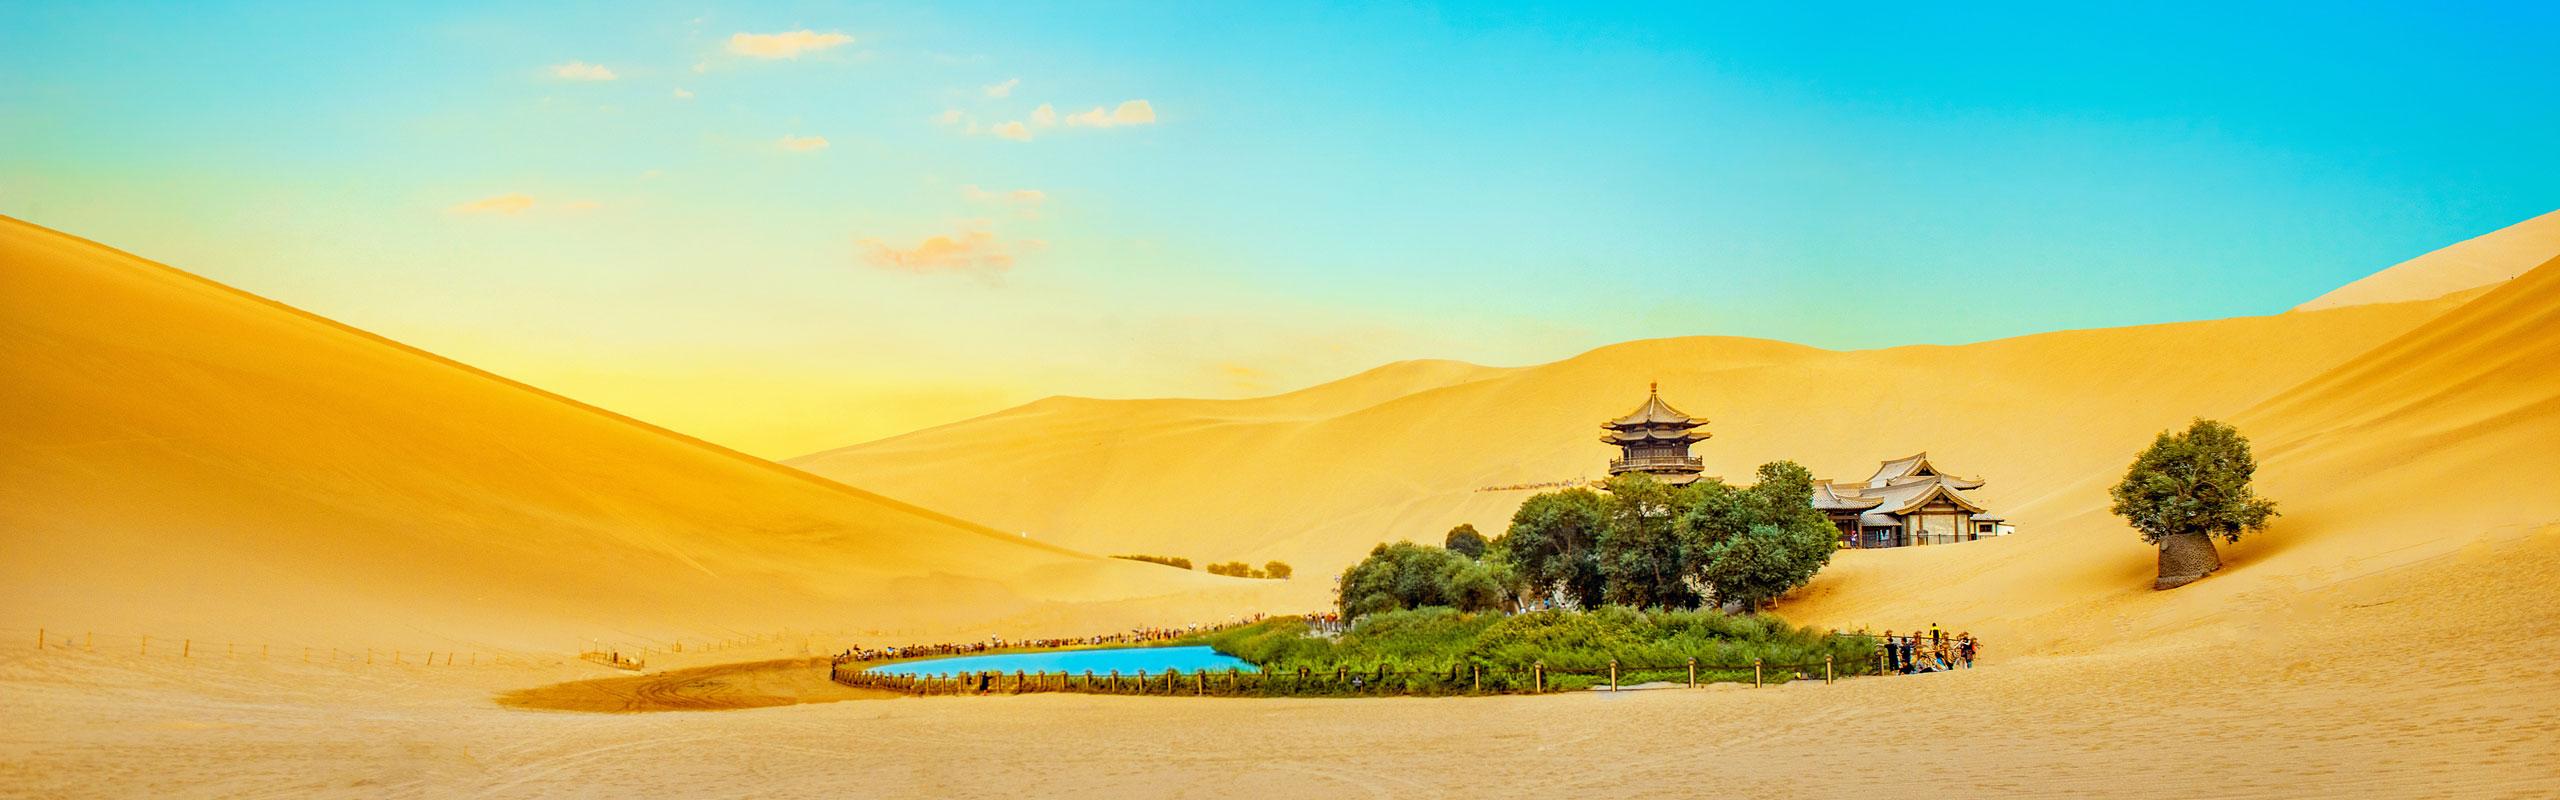 Xi'an Silk Road Adventure